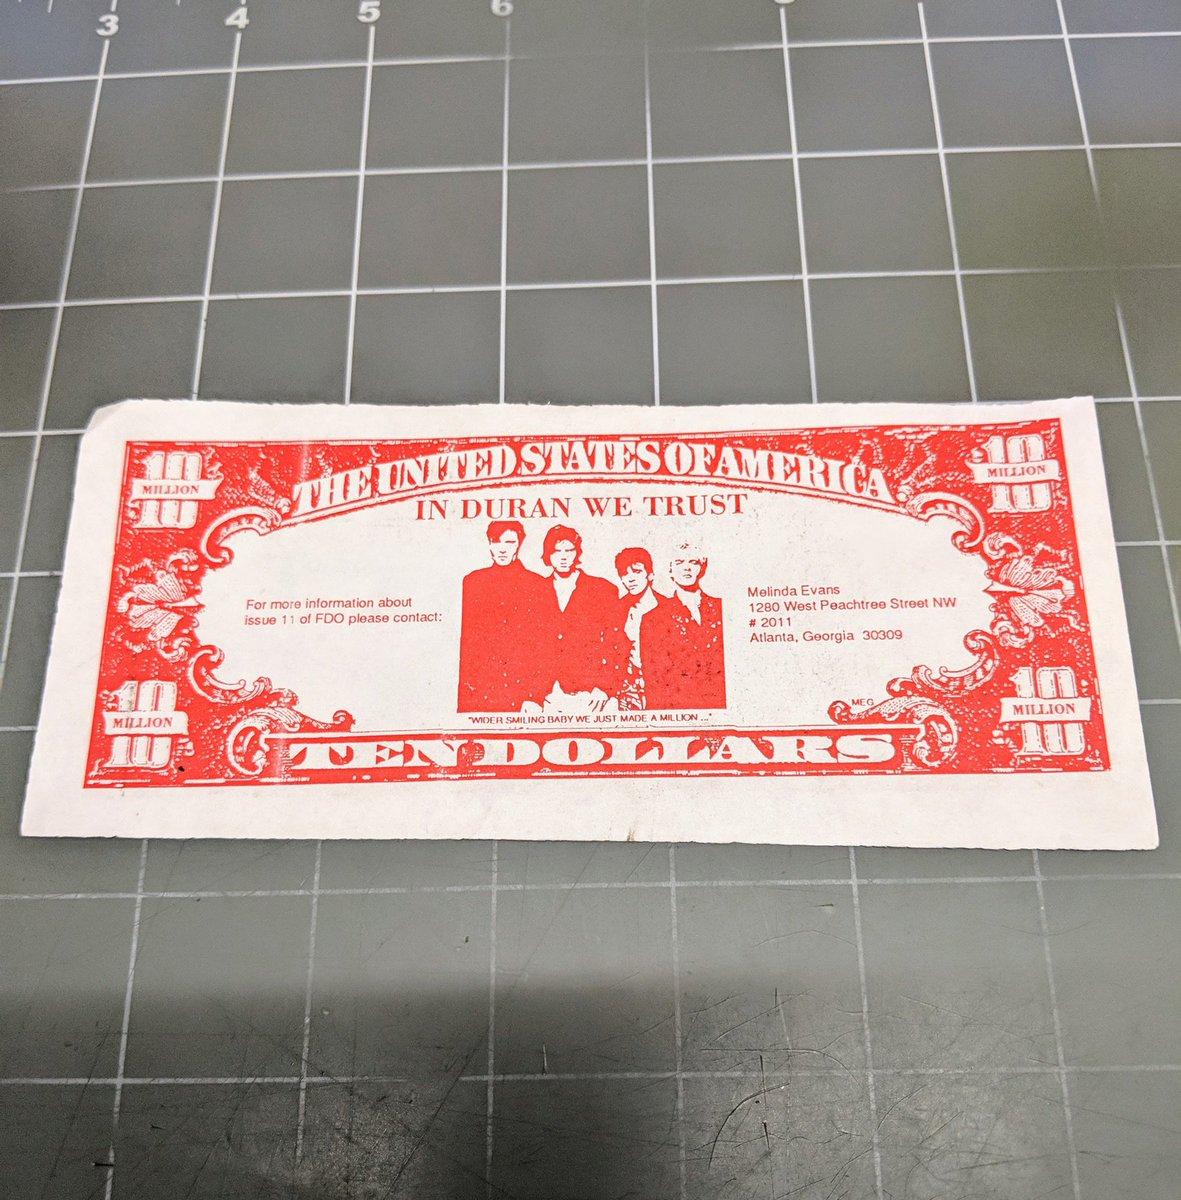 Hey @duranduran Is this still legal tender? Happy #DuranDuranAppreciationDay #DDAD18 <br>http://pic.twitter.com/RBfISN9MGs